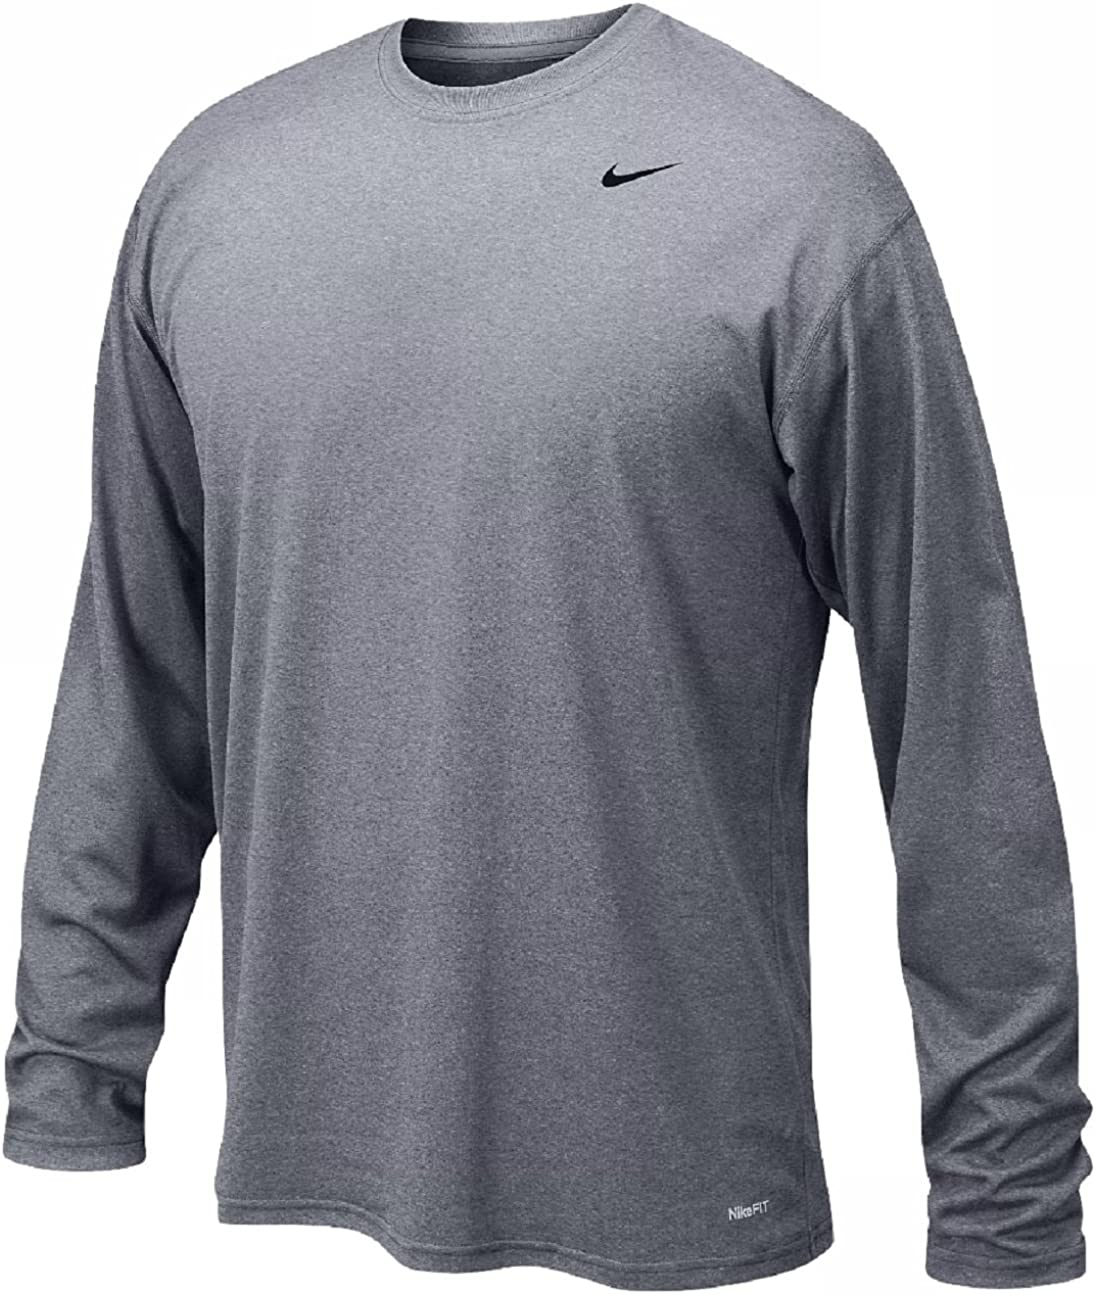 Nike Boys Legend Long Sleeve Athletic T-Shirt